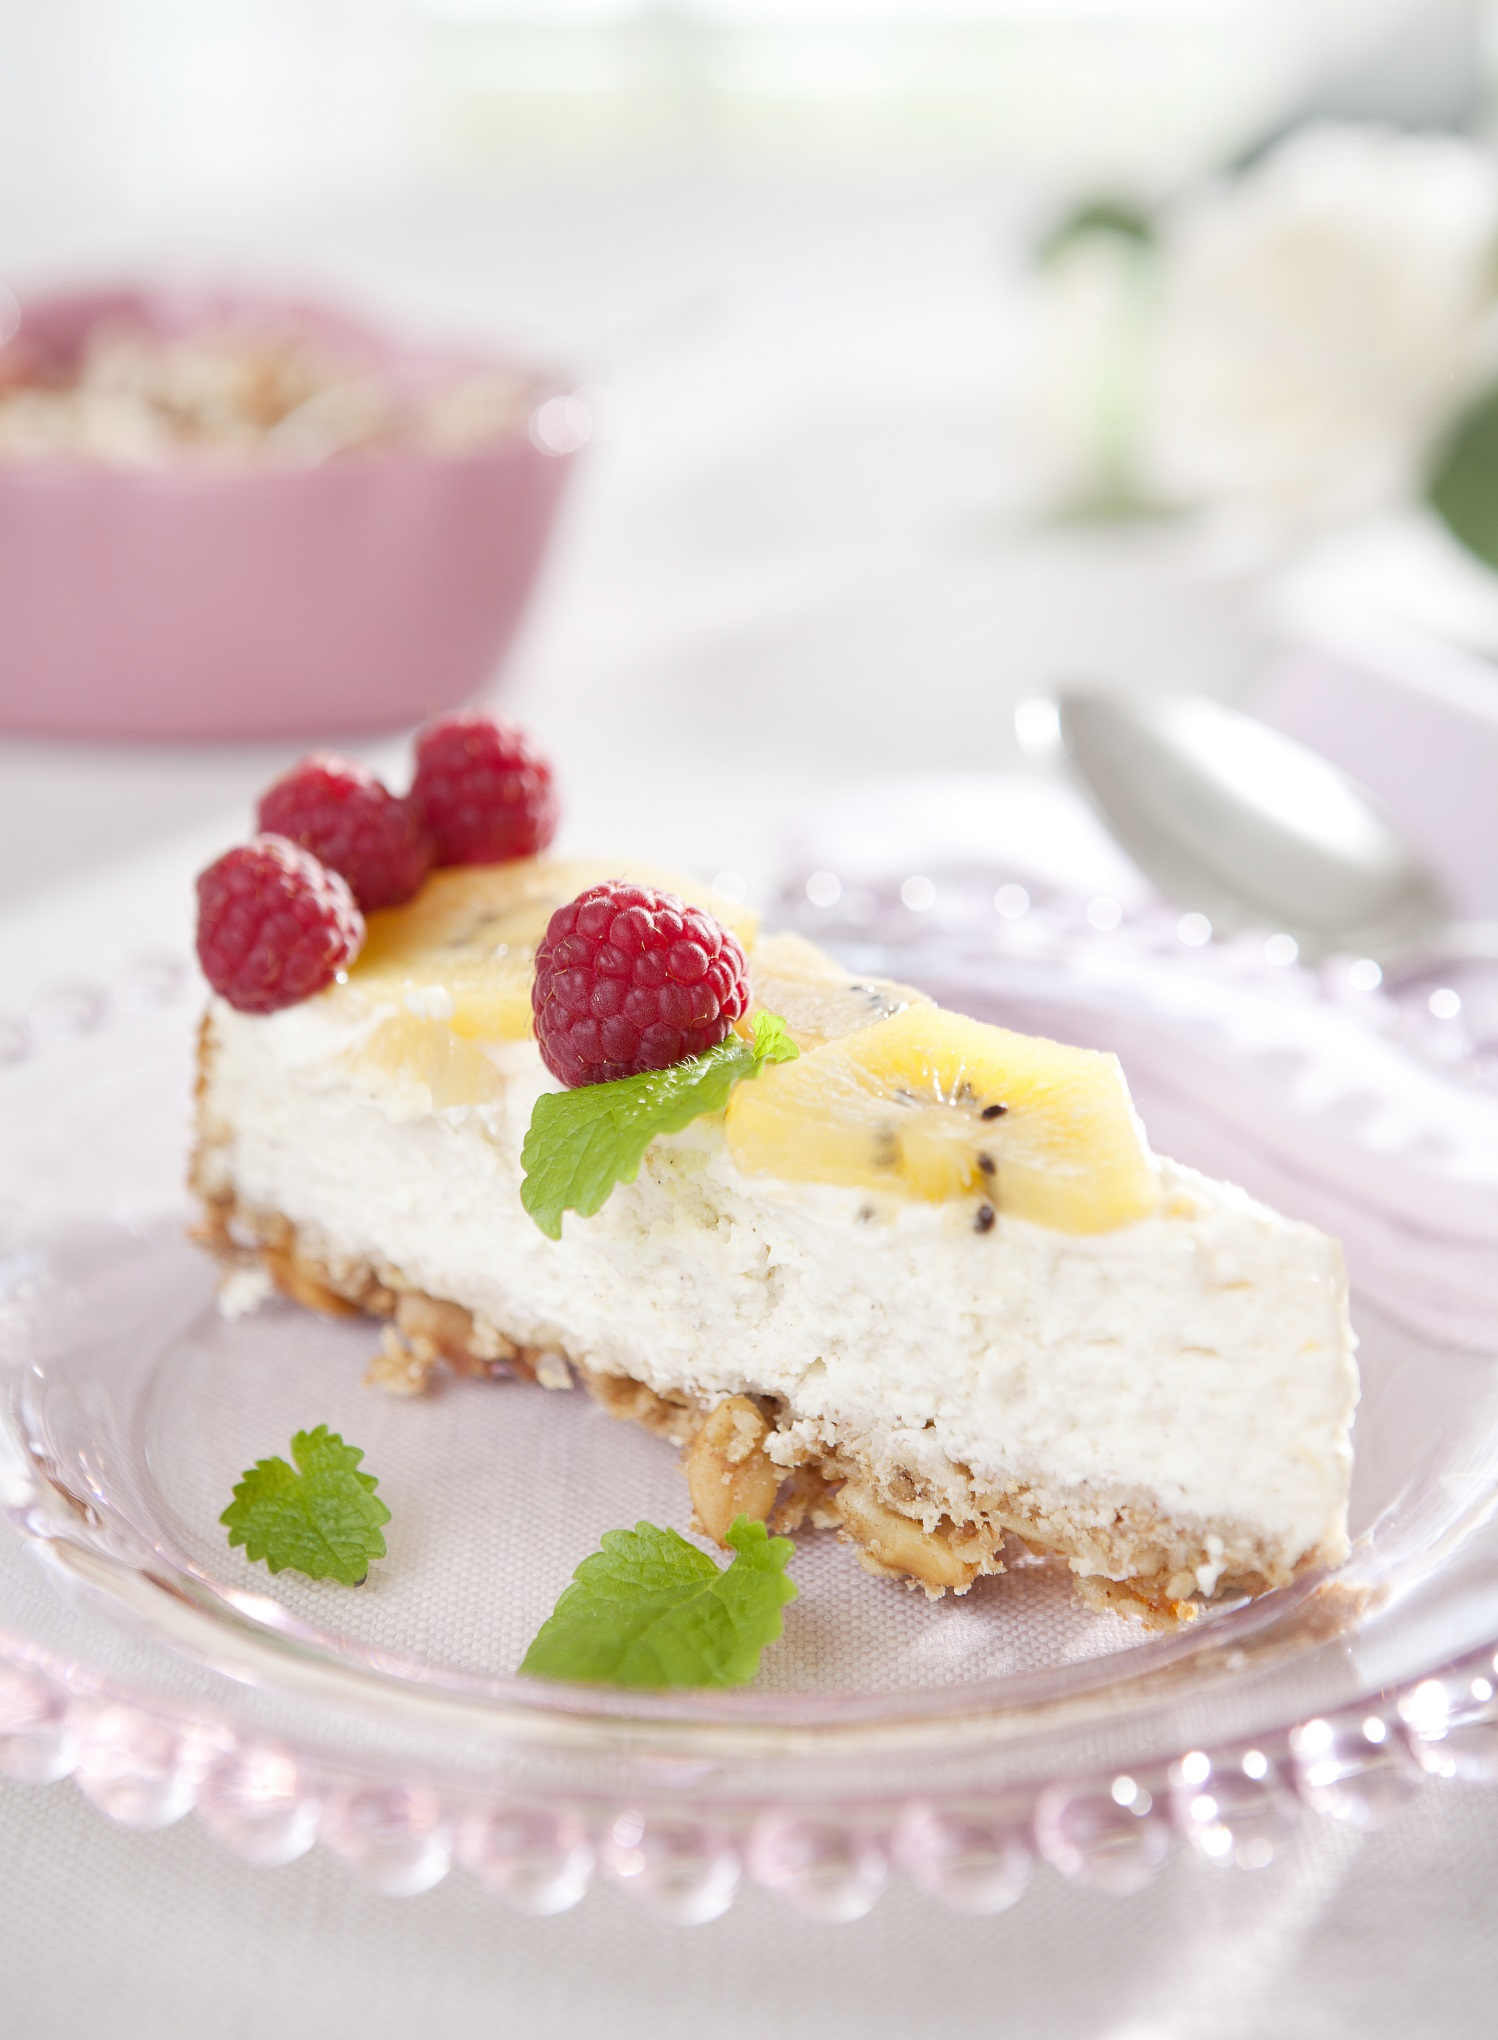 Ewalies Cheesecake